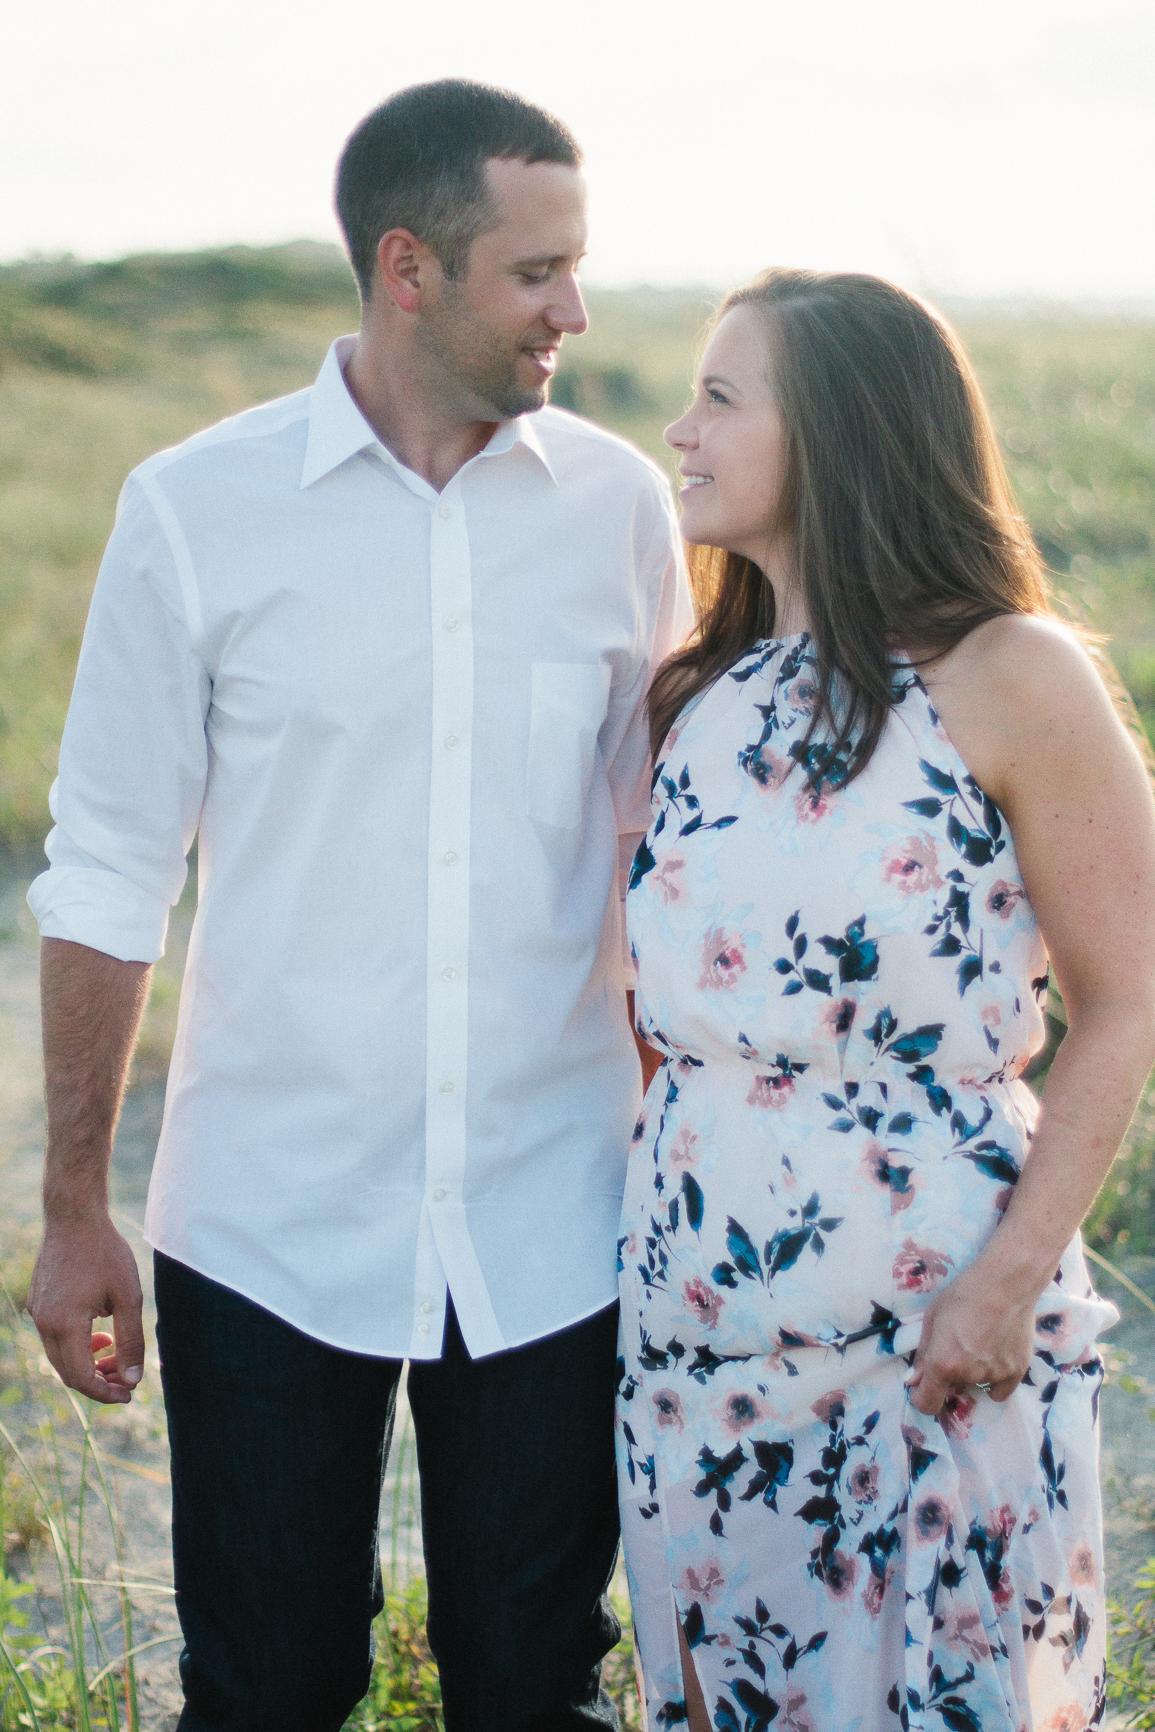 Engaged couple smiling at Kiawah Island Beach Resort, Kiawah Island South Carolina by Danielle Gallo Photography